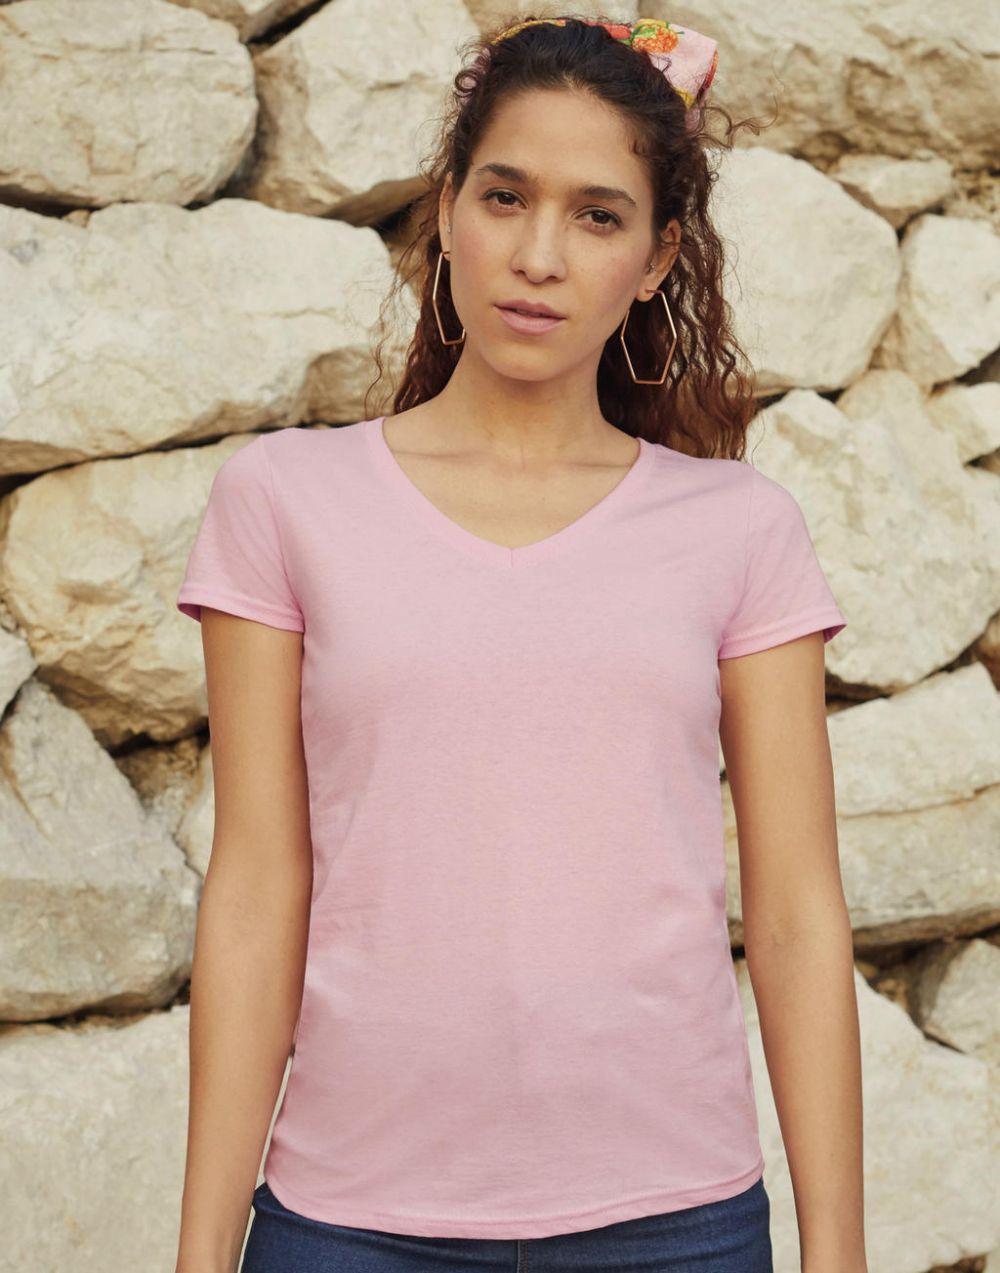 Camisetas manga corta fruit of the loom cuello v valueweight corte femenino imagen 1